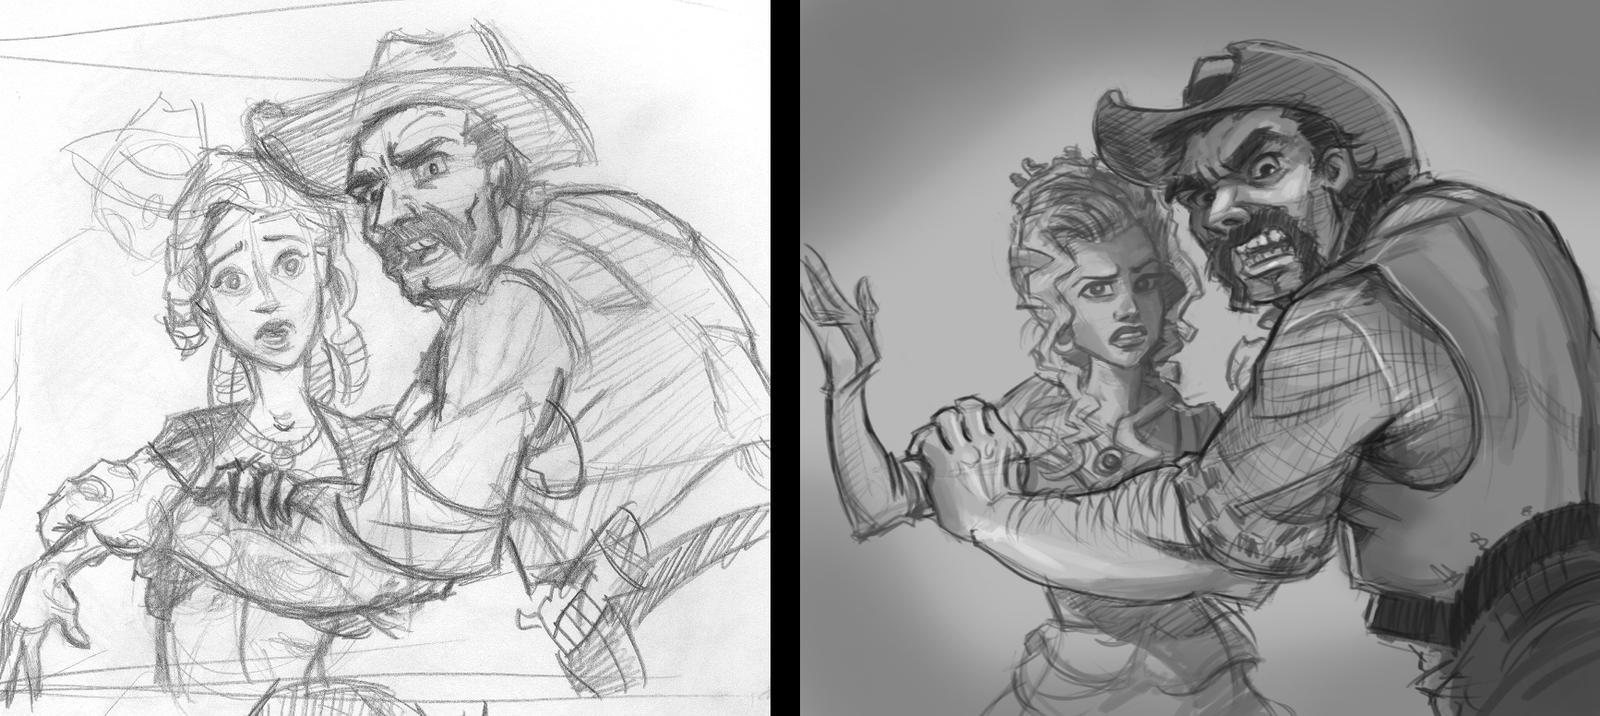 Sketch Remake by LucasZebroski